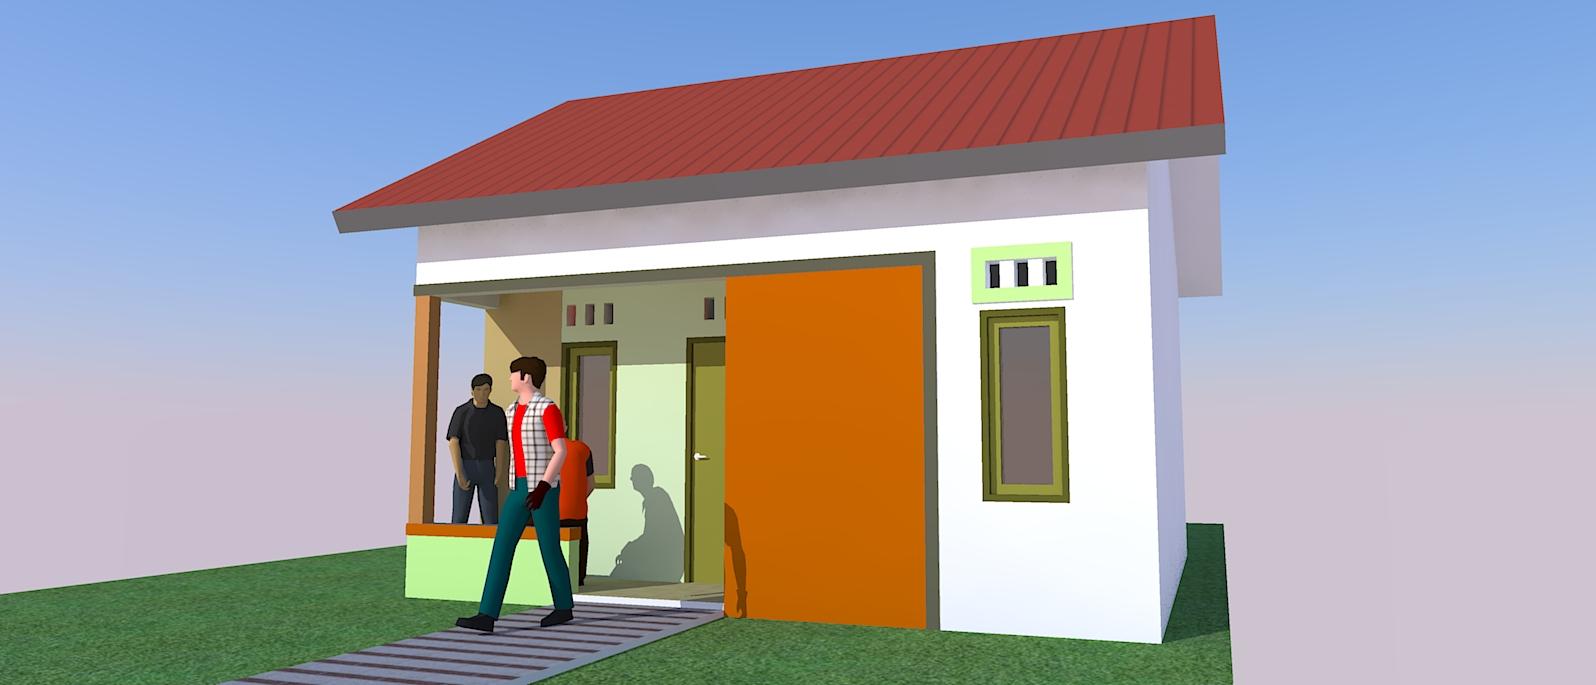 Image Result For Rumah Subsidi Olx Lampung